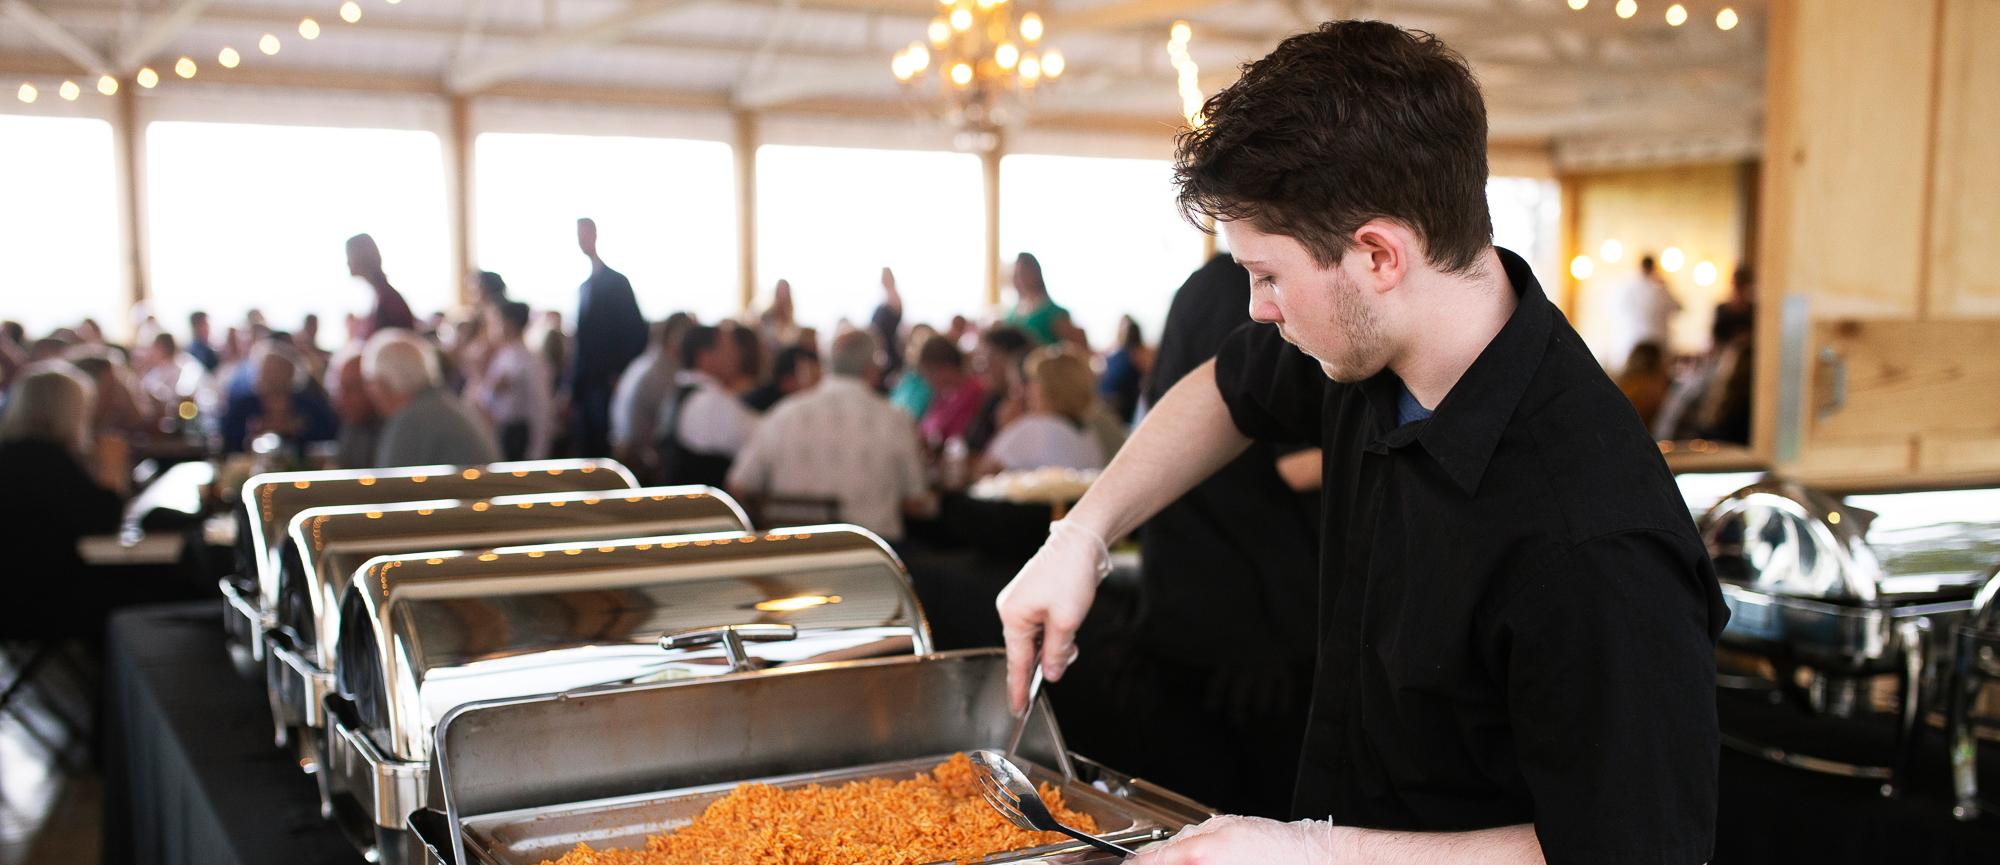 abritin-catering-career-jobs